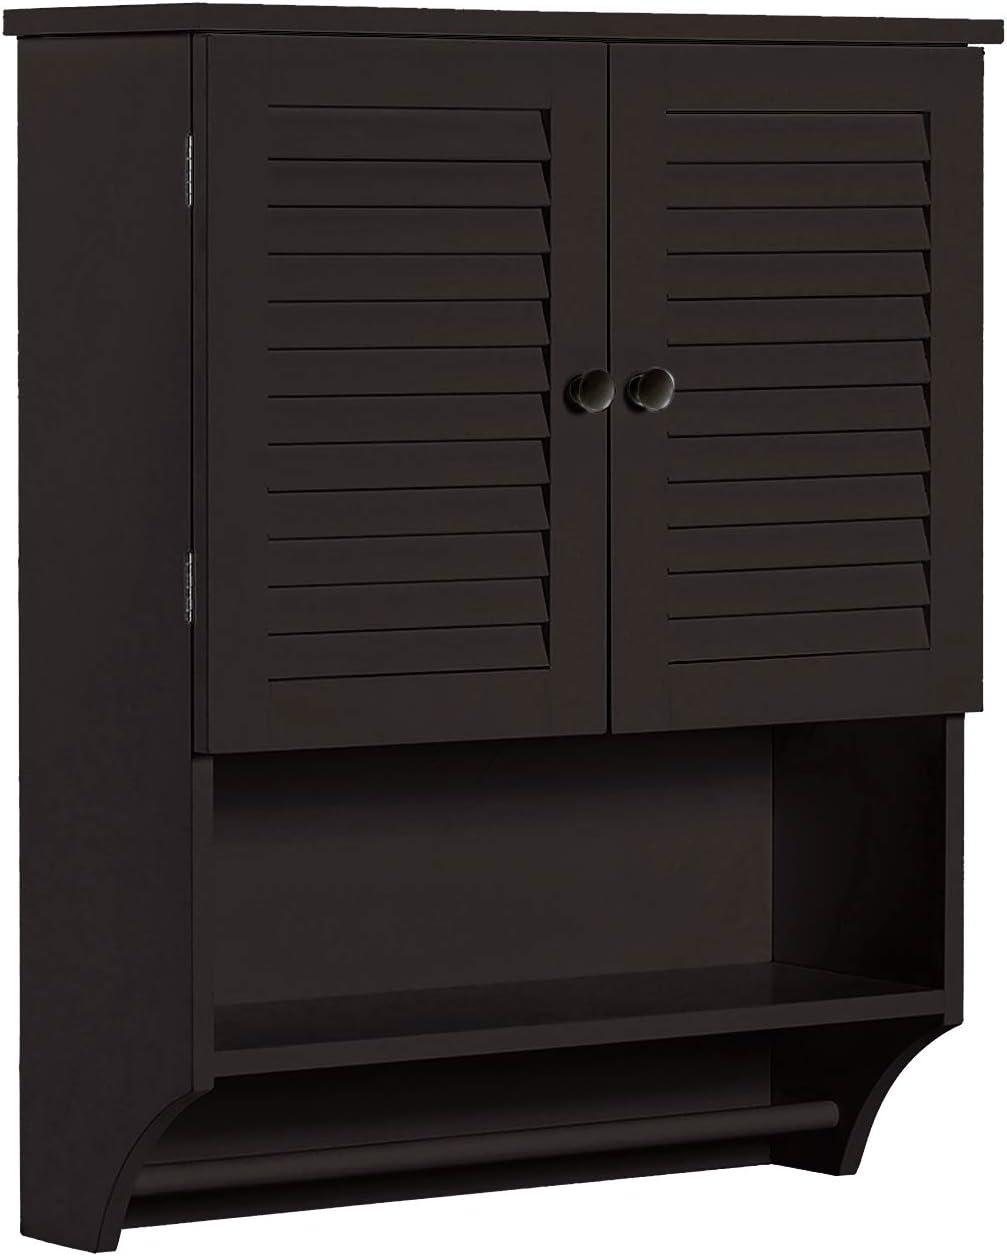 ChooChoo Bathroom Medicine Cabinet 2-Door Wall Cabinet Wood Hanging Cabinet with Adjustable Shelves and Towels Bar, Espresso